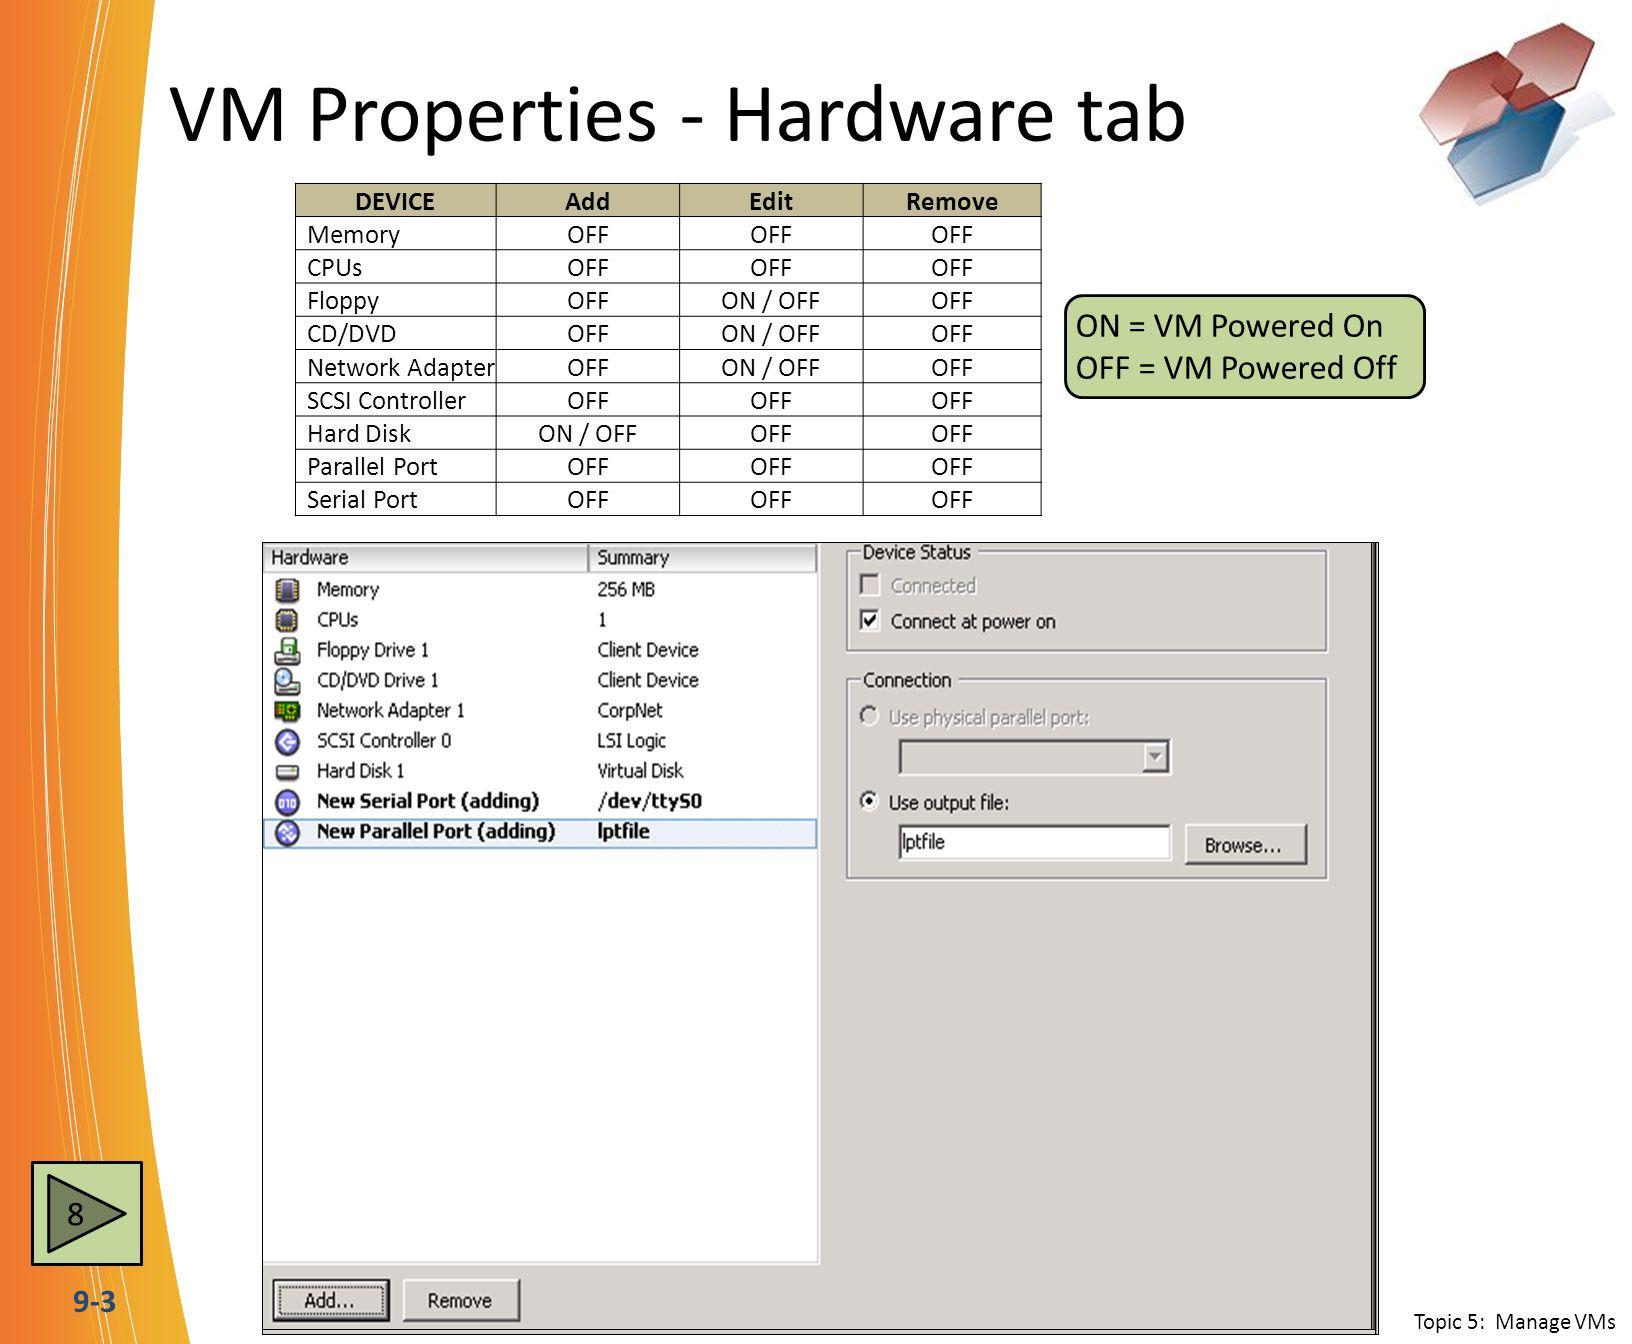 9-3 VM Properties - Hardware tab Topic 5: Manage VMs DEVICEAddEditRemove MemoryOFF CPUsOFF FloppyOFFON / OFFOFF CD/DVDOFFON / OFFOFF Network AdapterOF